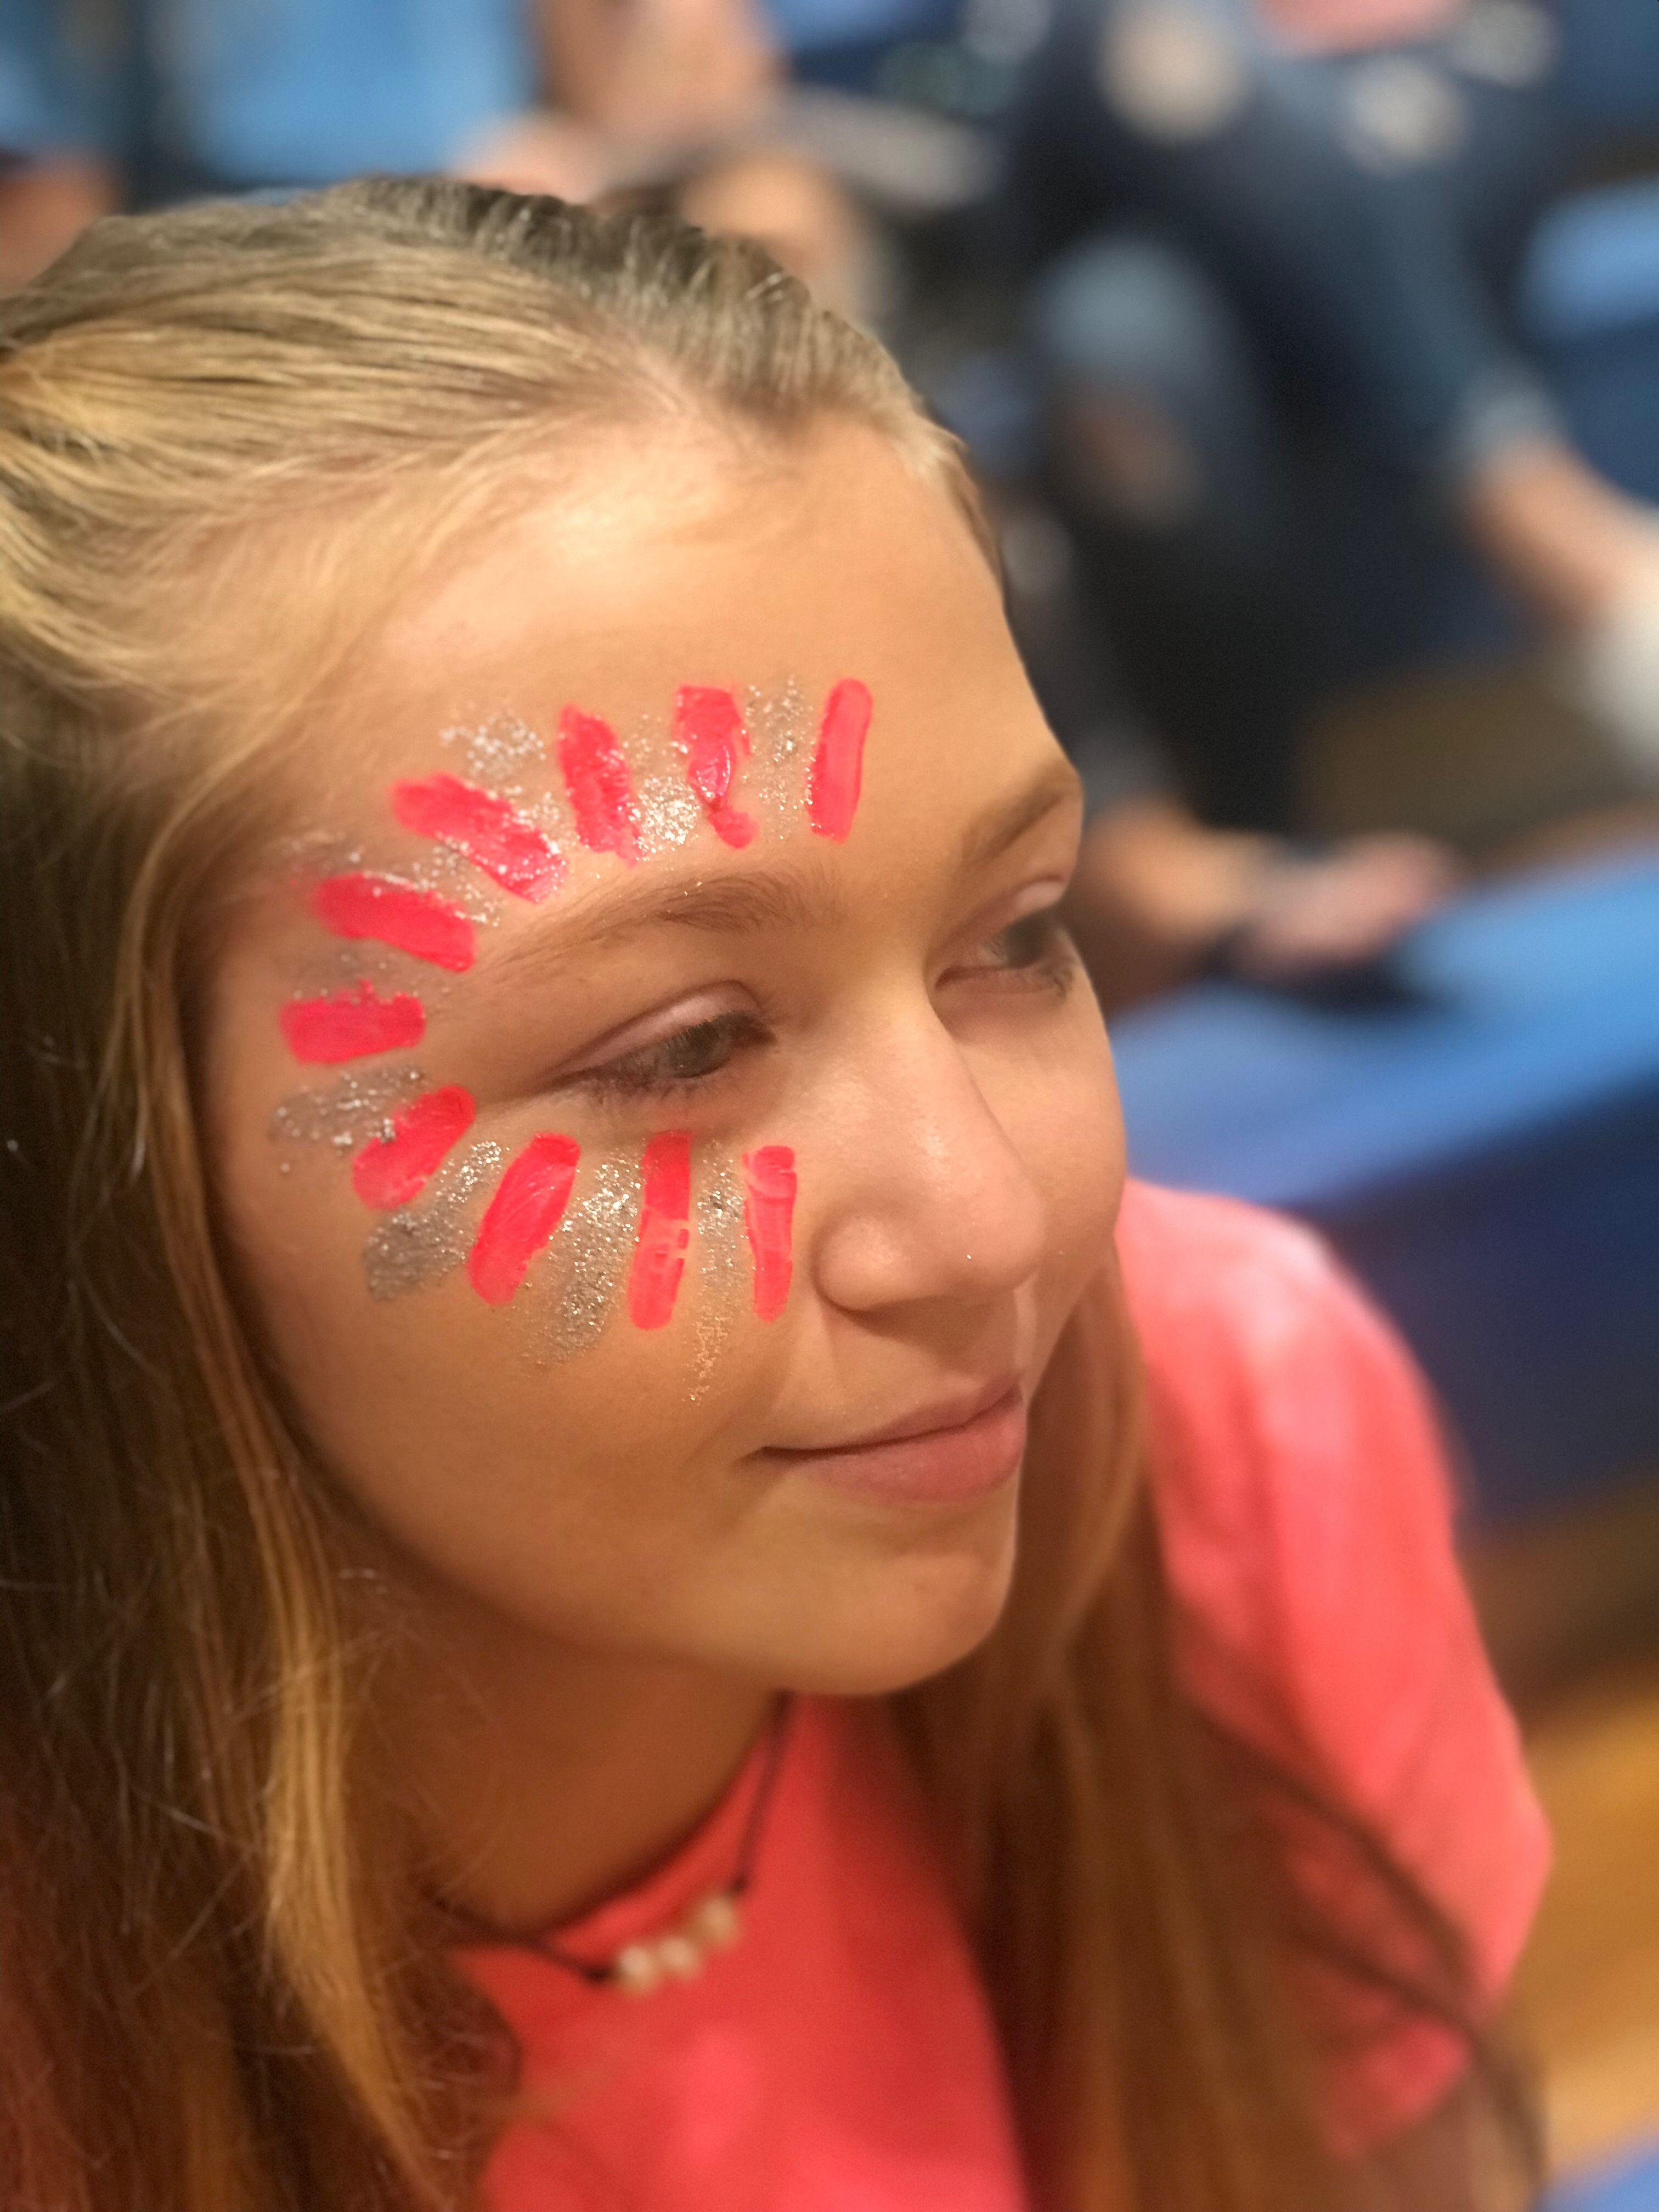 Pin By Madison Derosa On Football Szn School Spirit Face Paint Spirit Week Outfits Homecoming Spirit